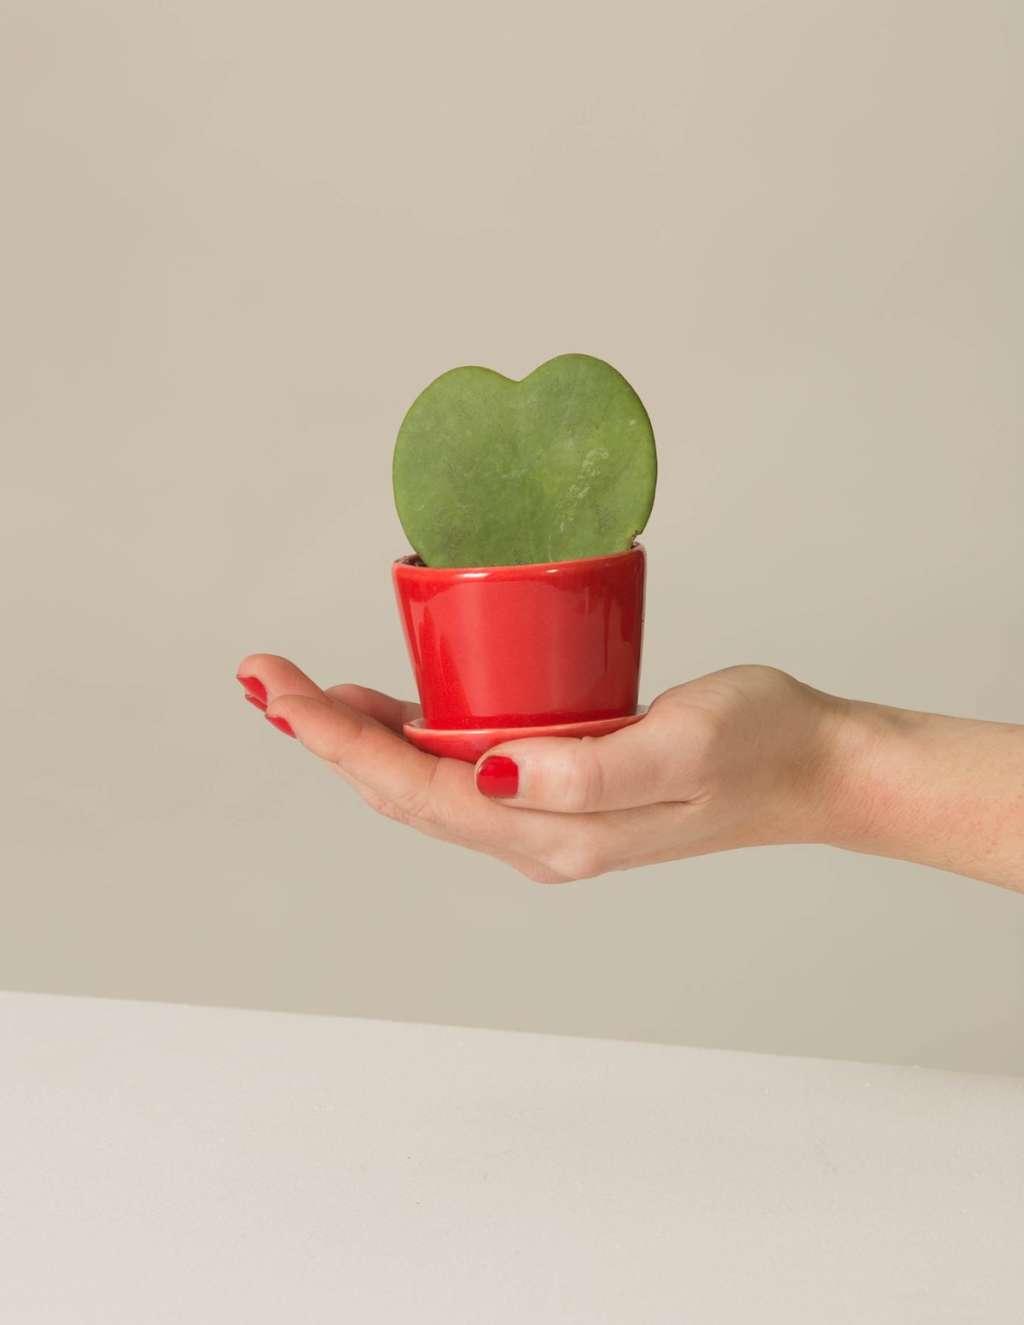 Sweetheart Wax Plant Care - Hoya Kerrii Heart   Apartment Therapy